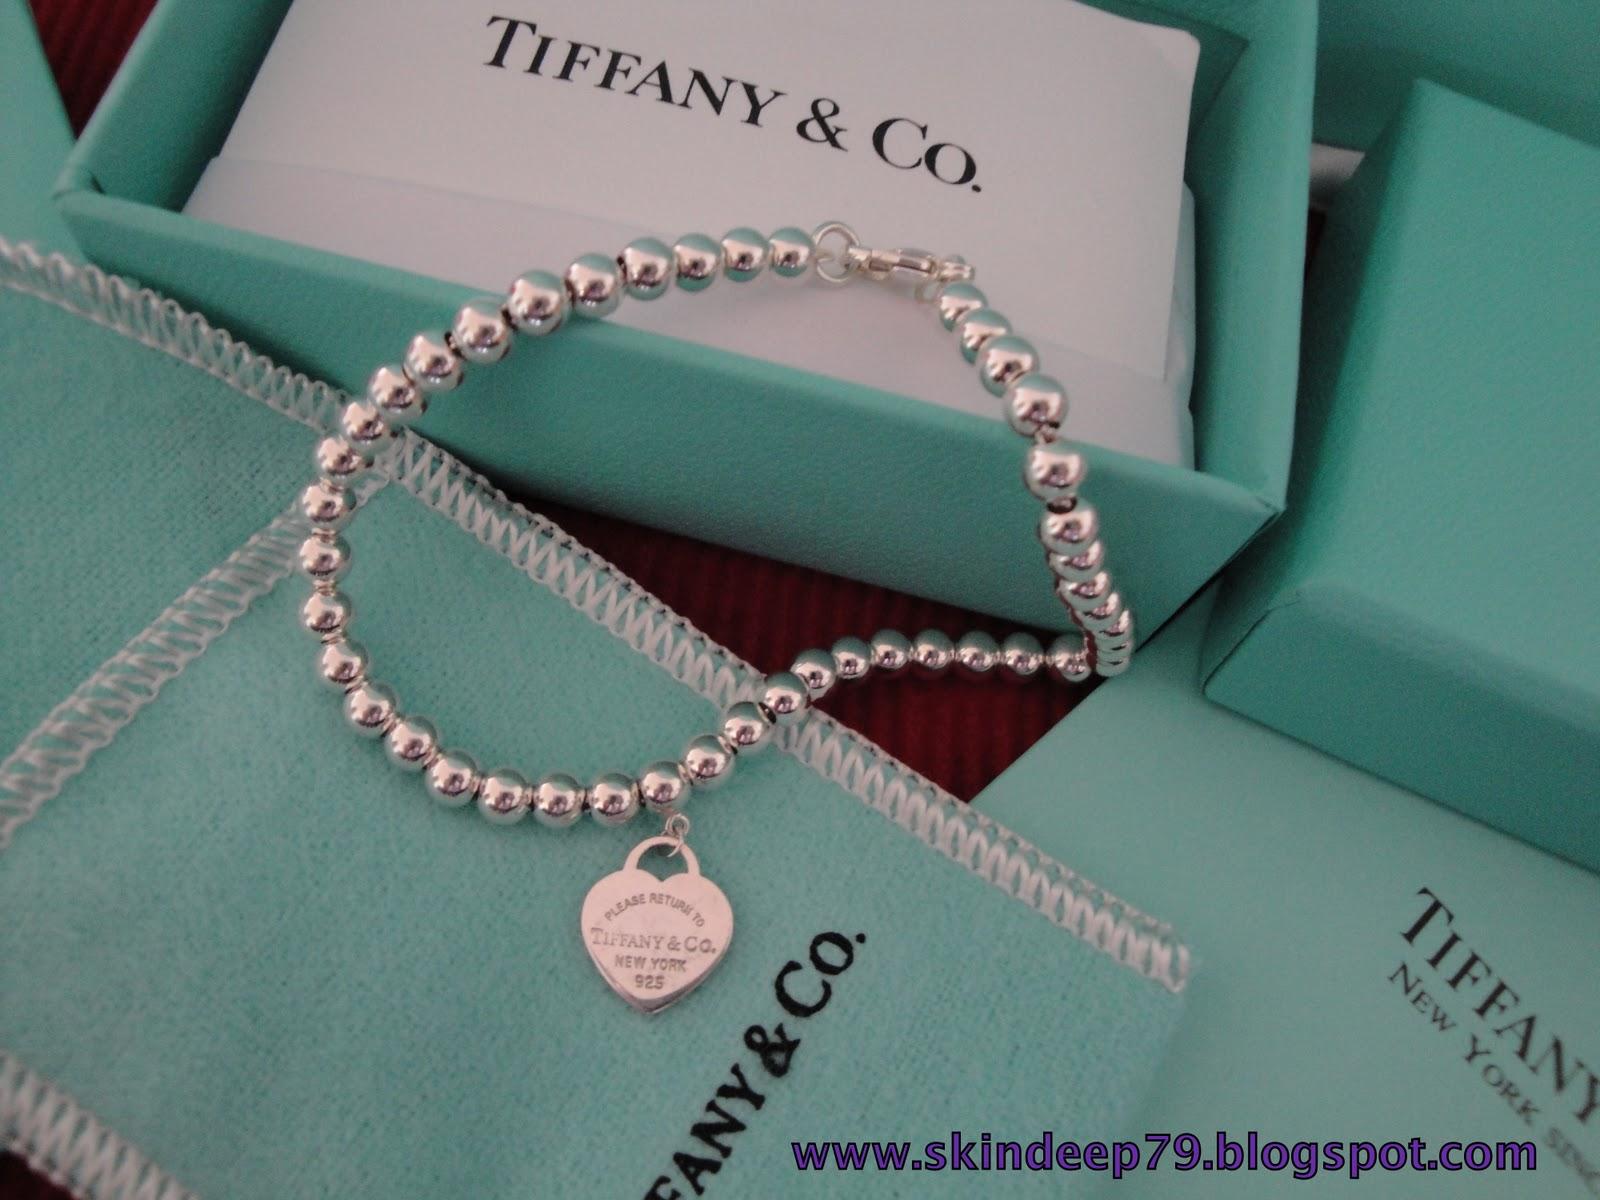 e0099cd79 Tiffany Mini Heart Lock Bracelet - Image Of Bracelet